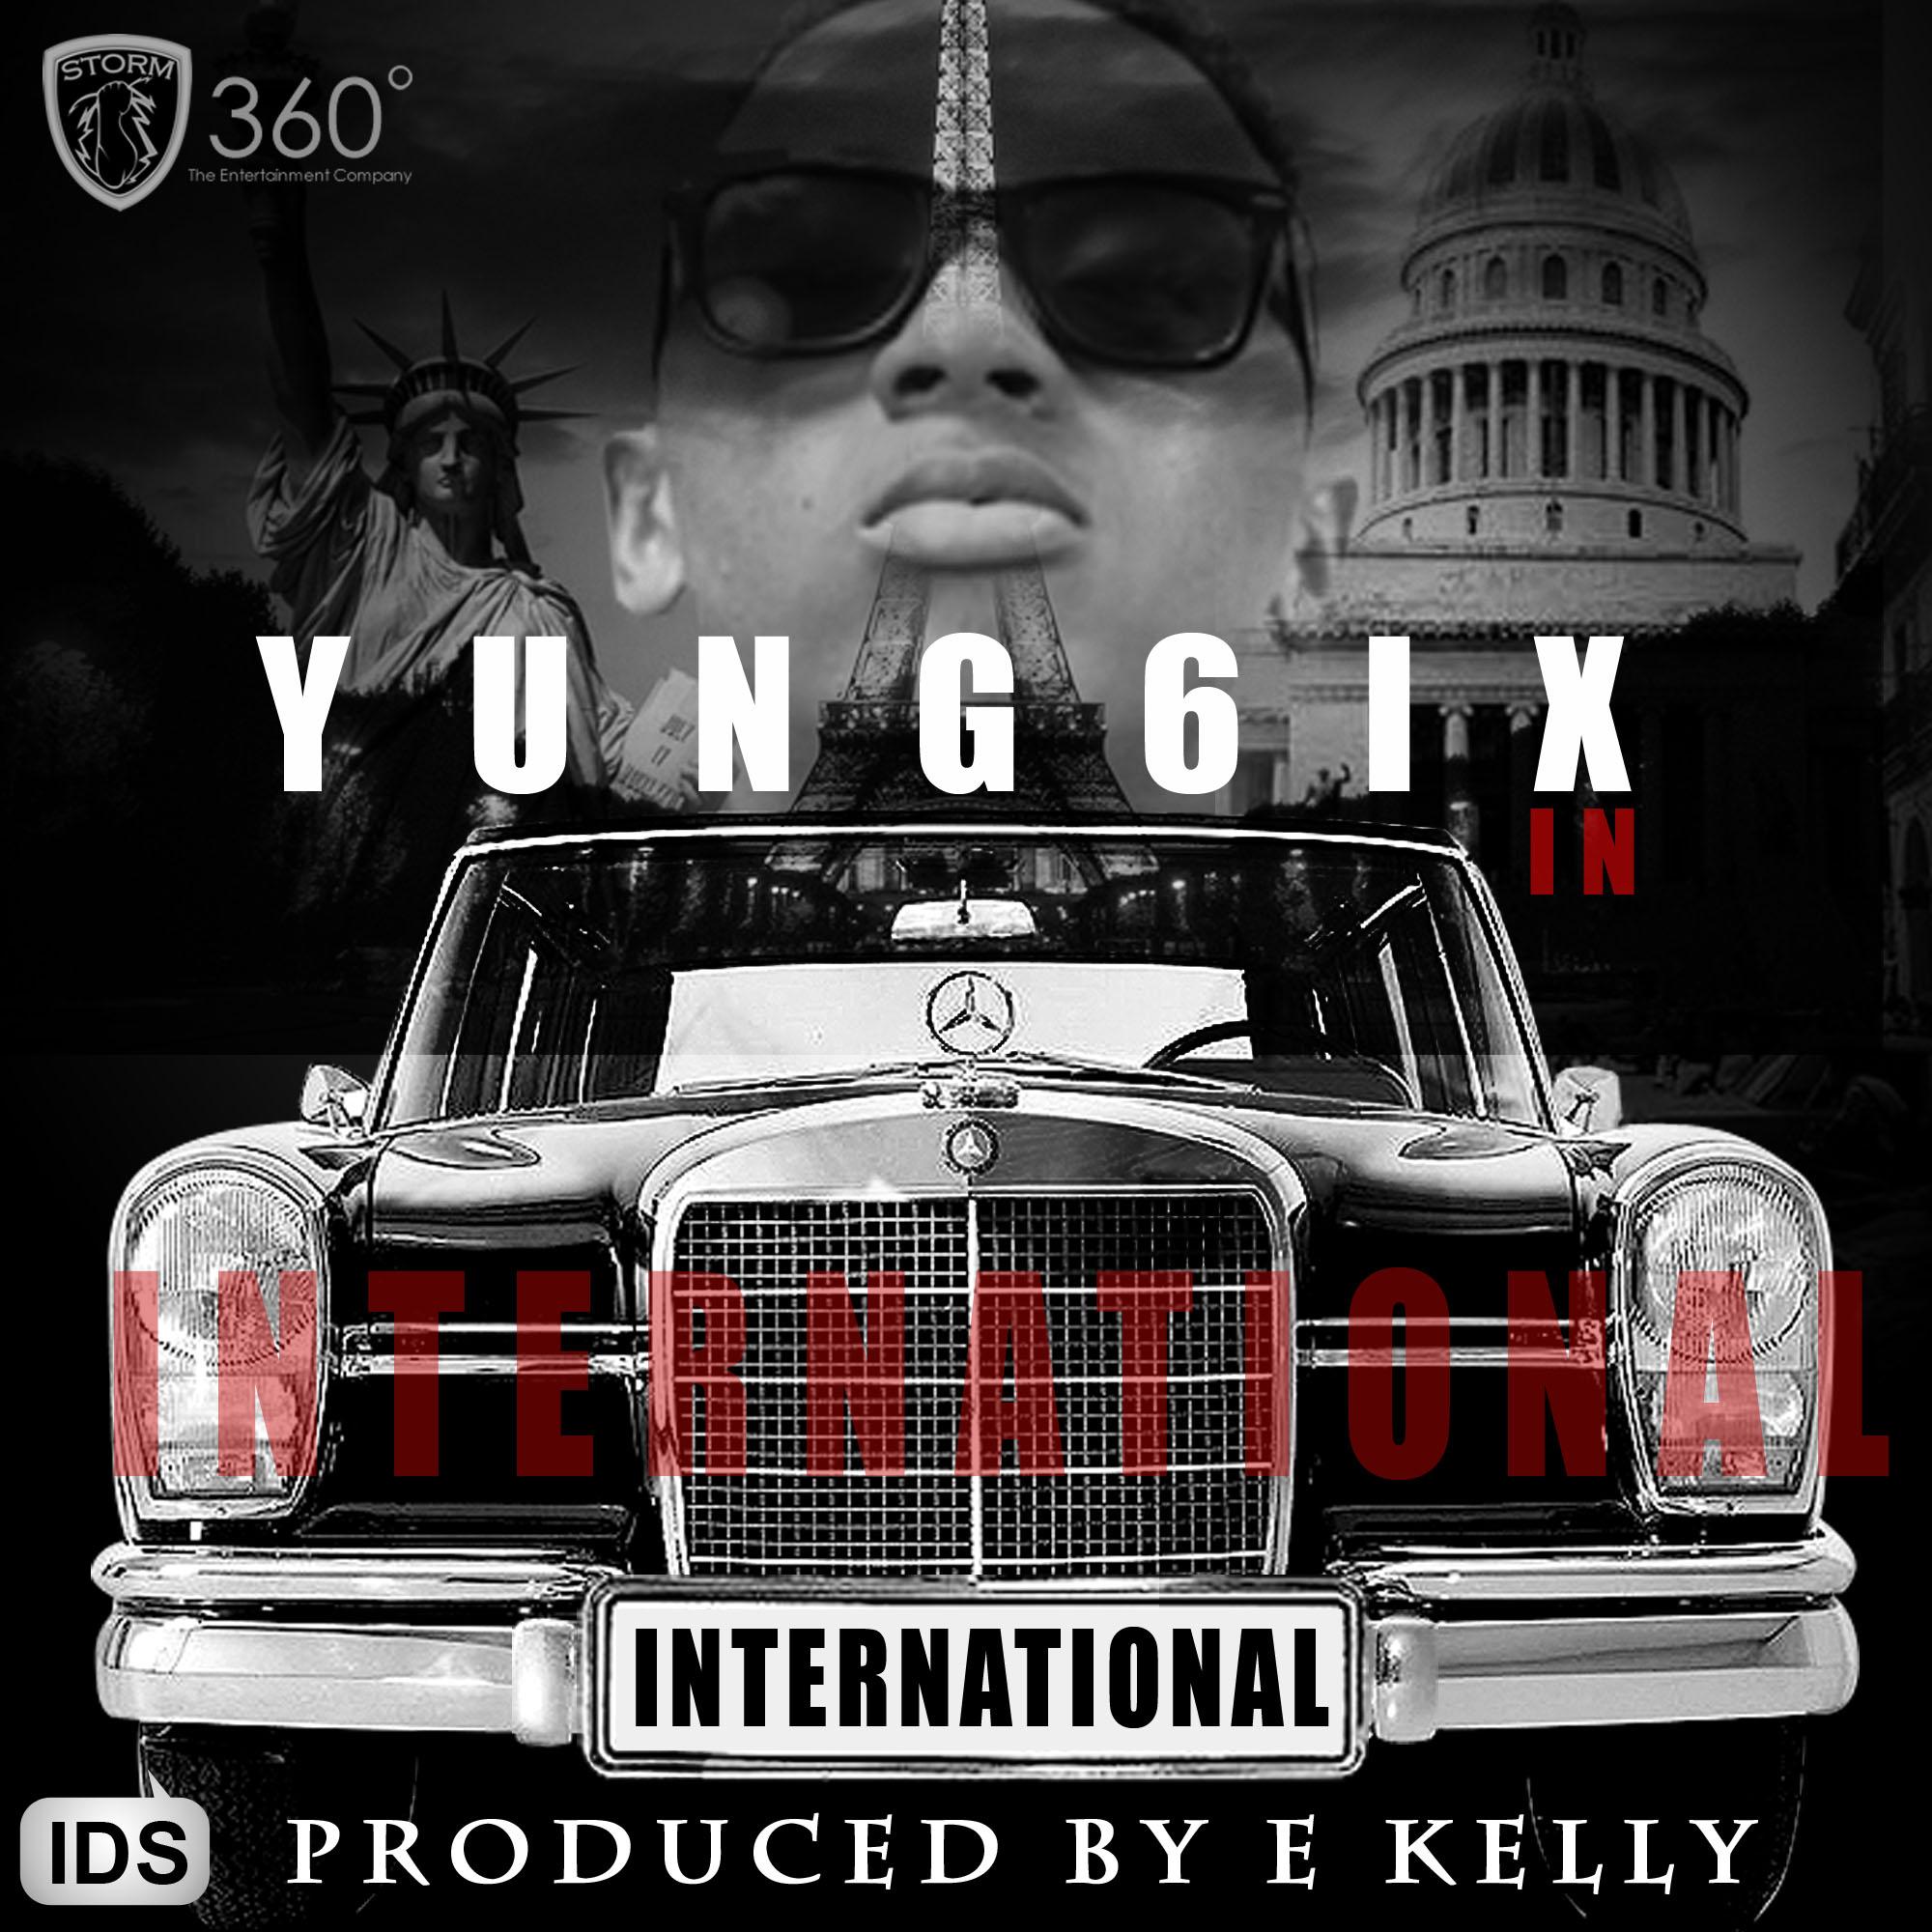 Yung6ix International art